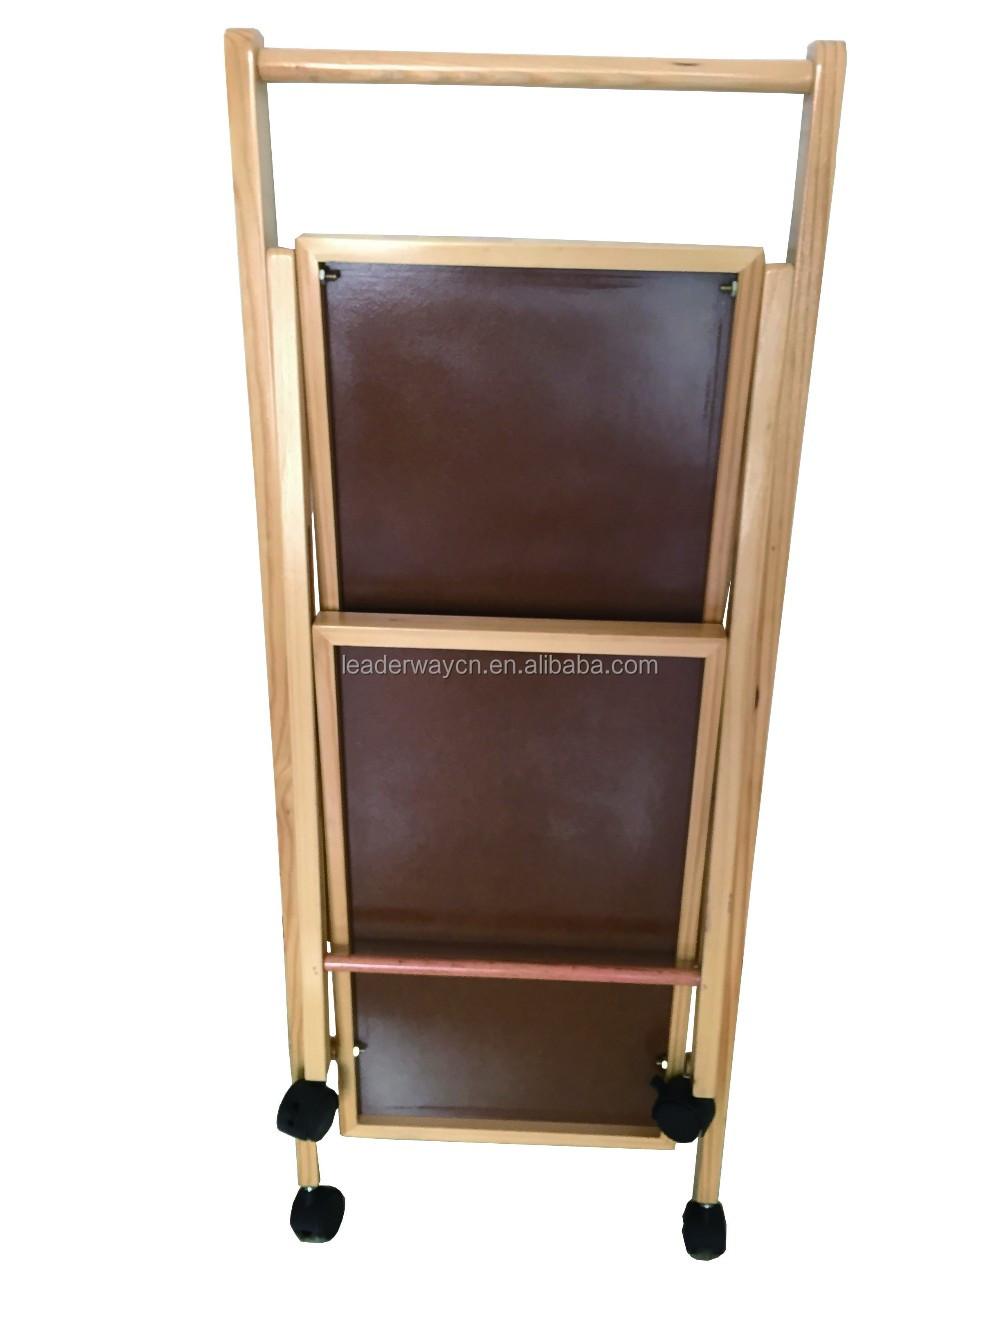 3 Tier Kitchen Storage Trolleys Serving Cart Buy Serving